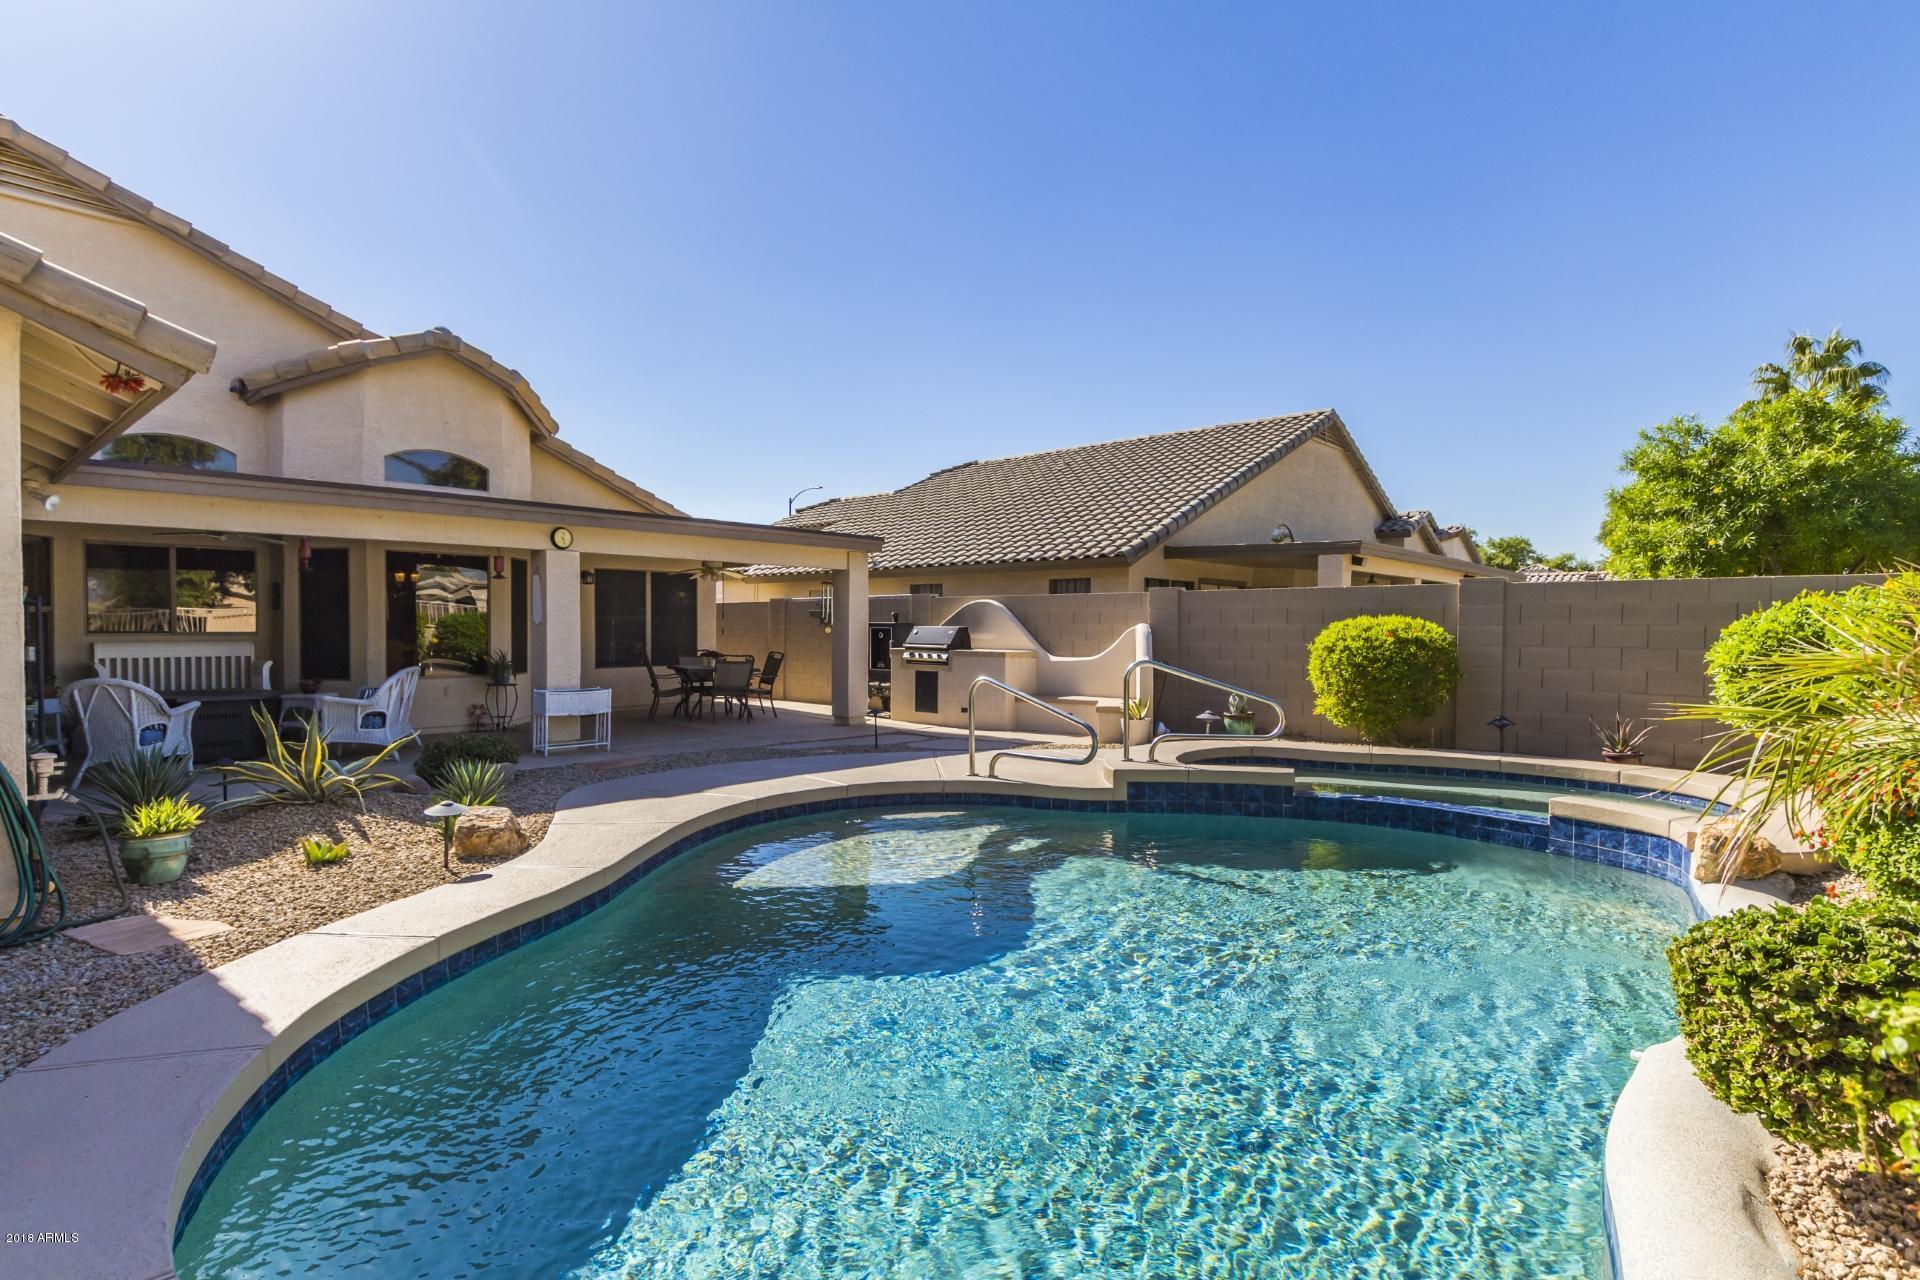 MLS 5845014 12740 W CAMBRIDGE Avenue, Avondale, AZ 85392 Avondale AZ Private Pool